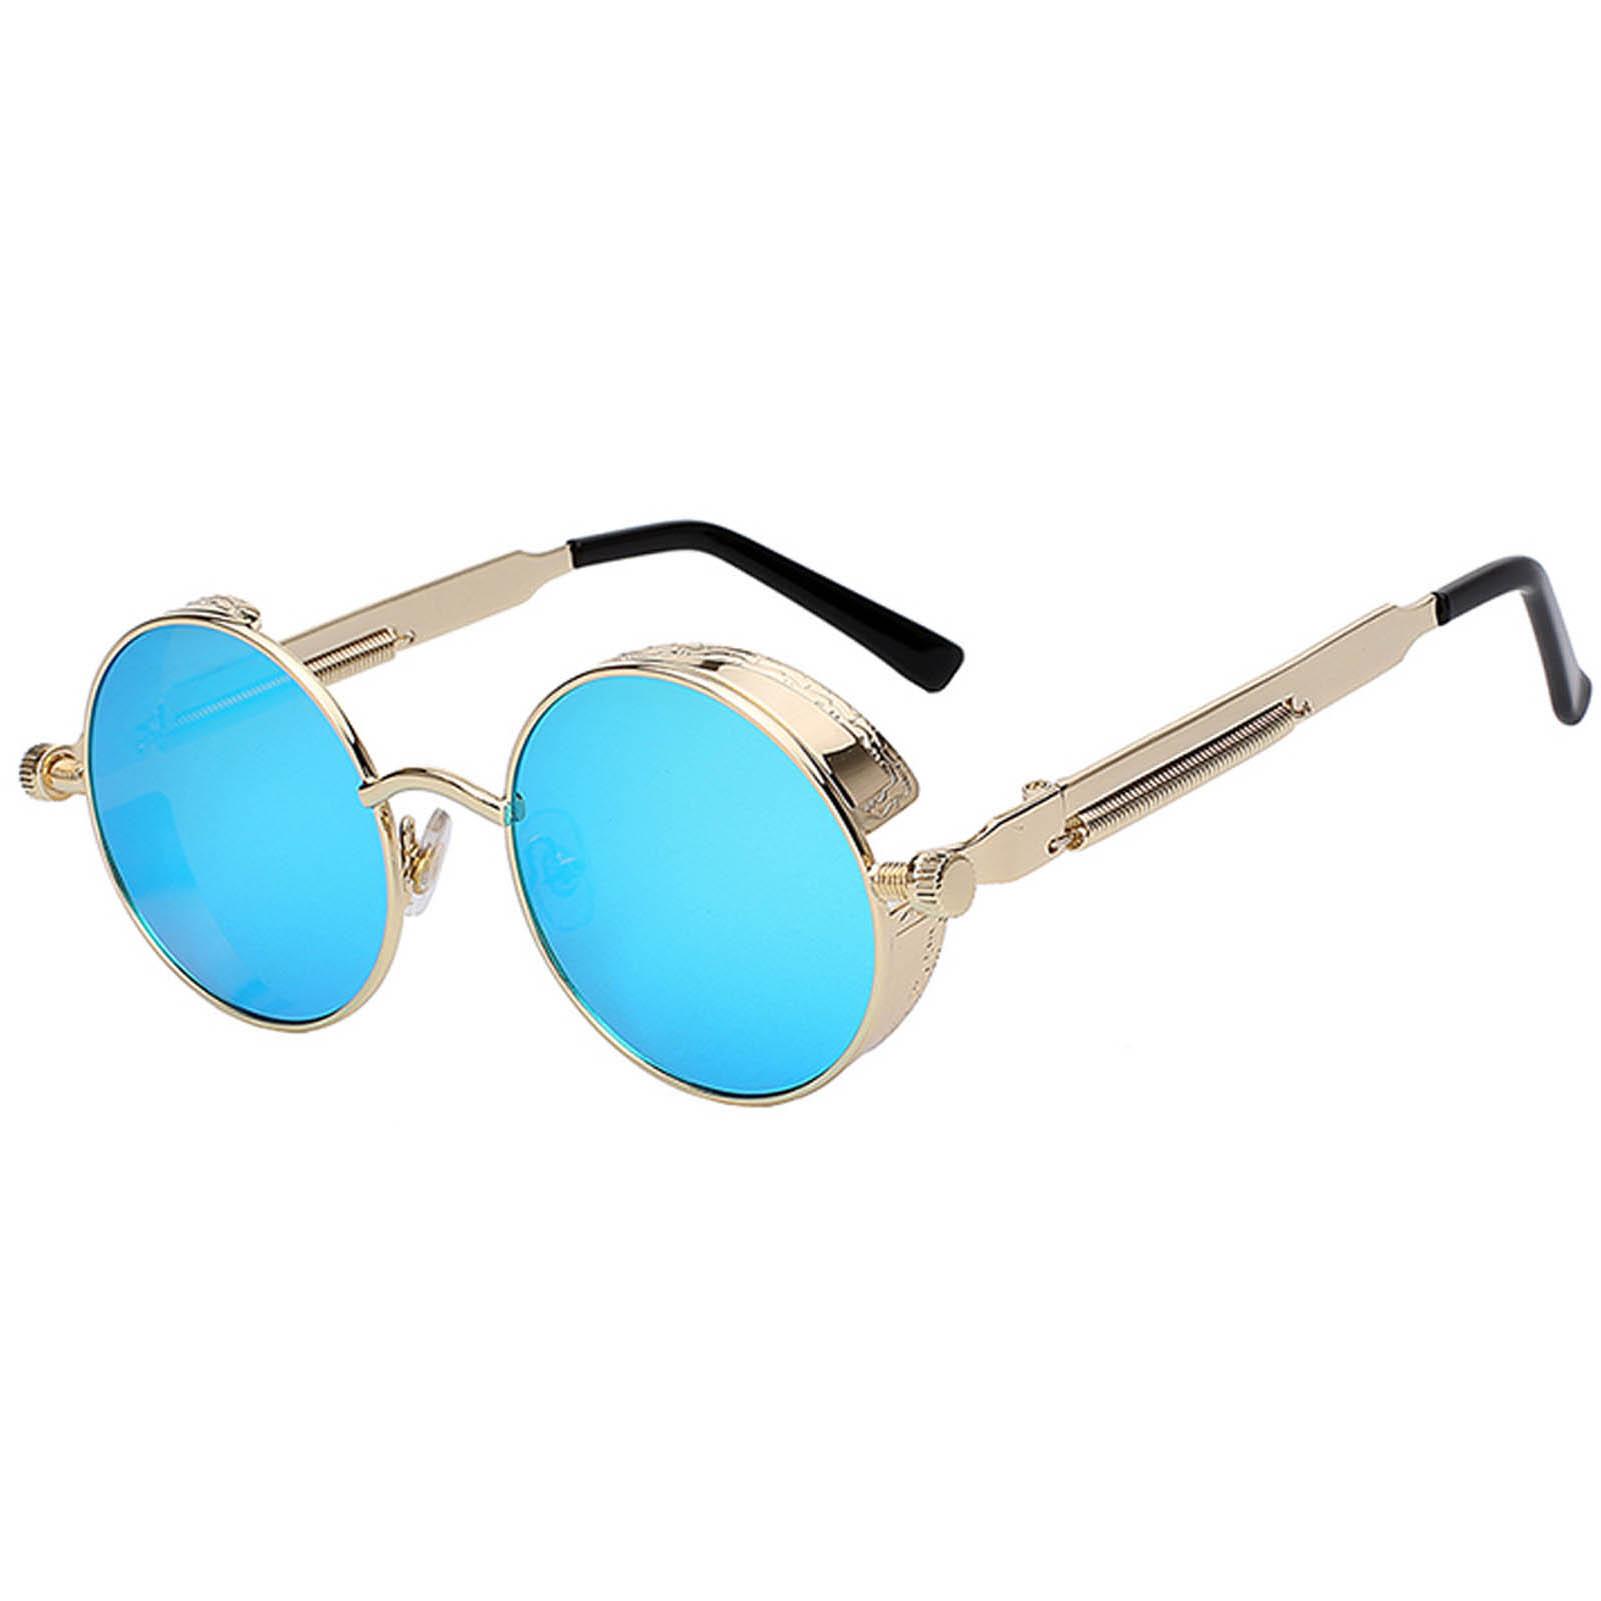 1e87e210b8 060 Steampunk C2 Gothic Sunglasses Metal Round Circle Gold Frame Blue Ice  Mirror Lens One Pair